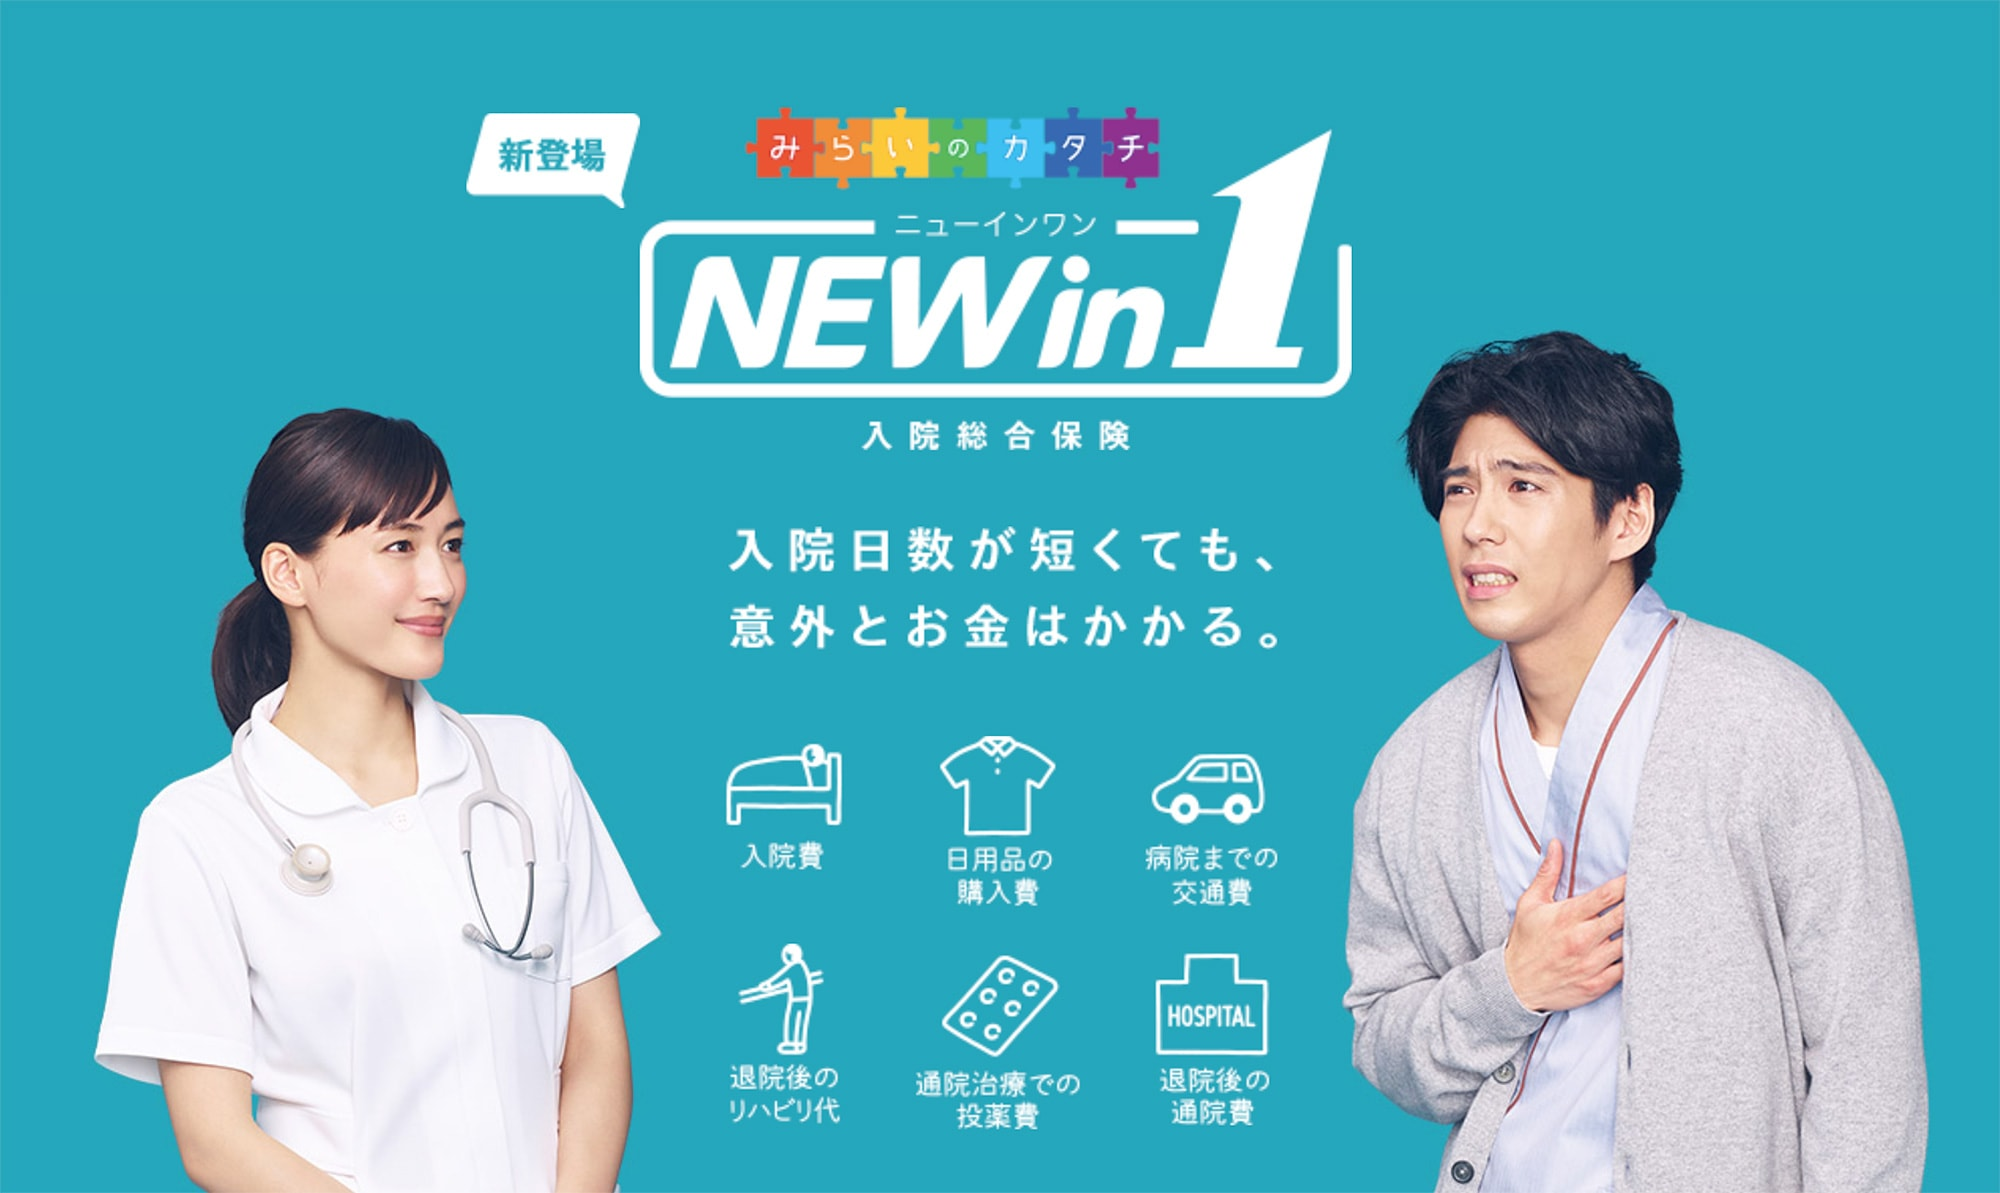 NEWin1 -ニューインワン-